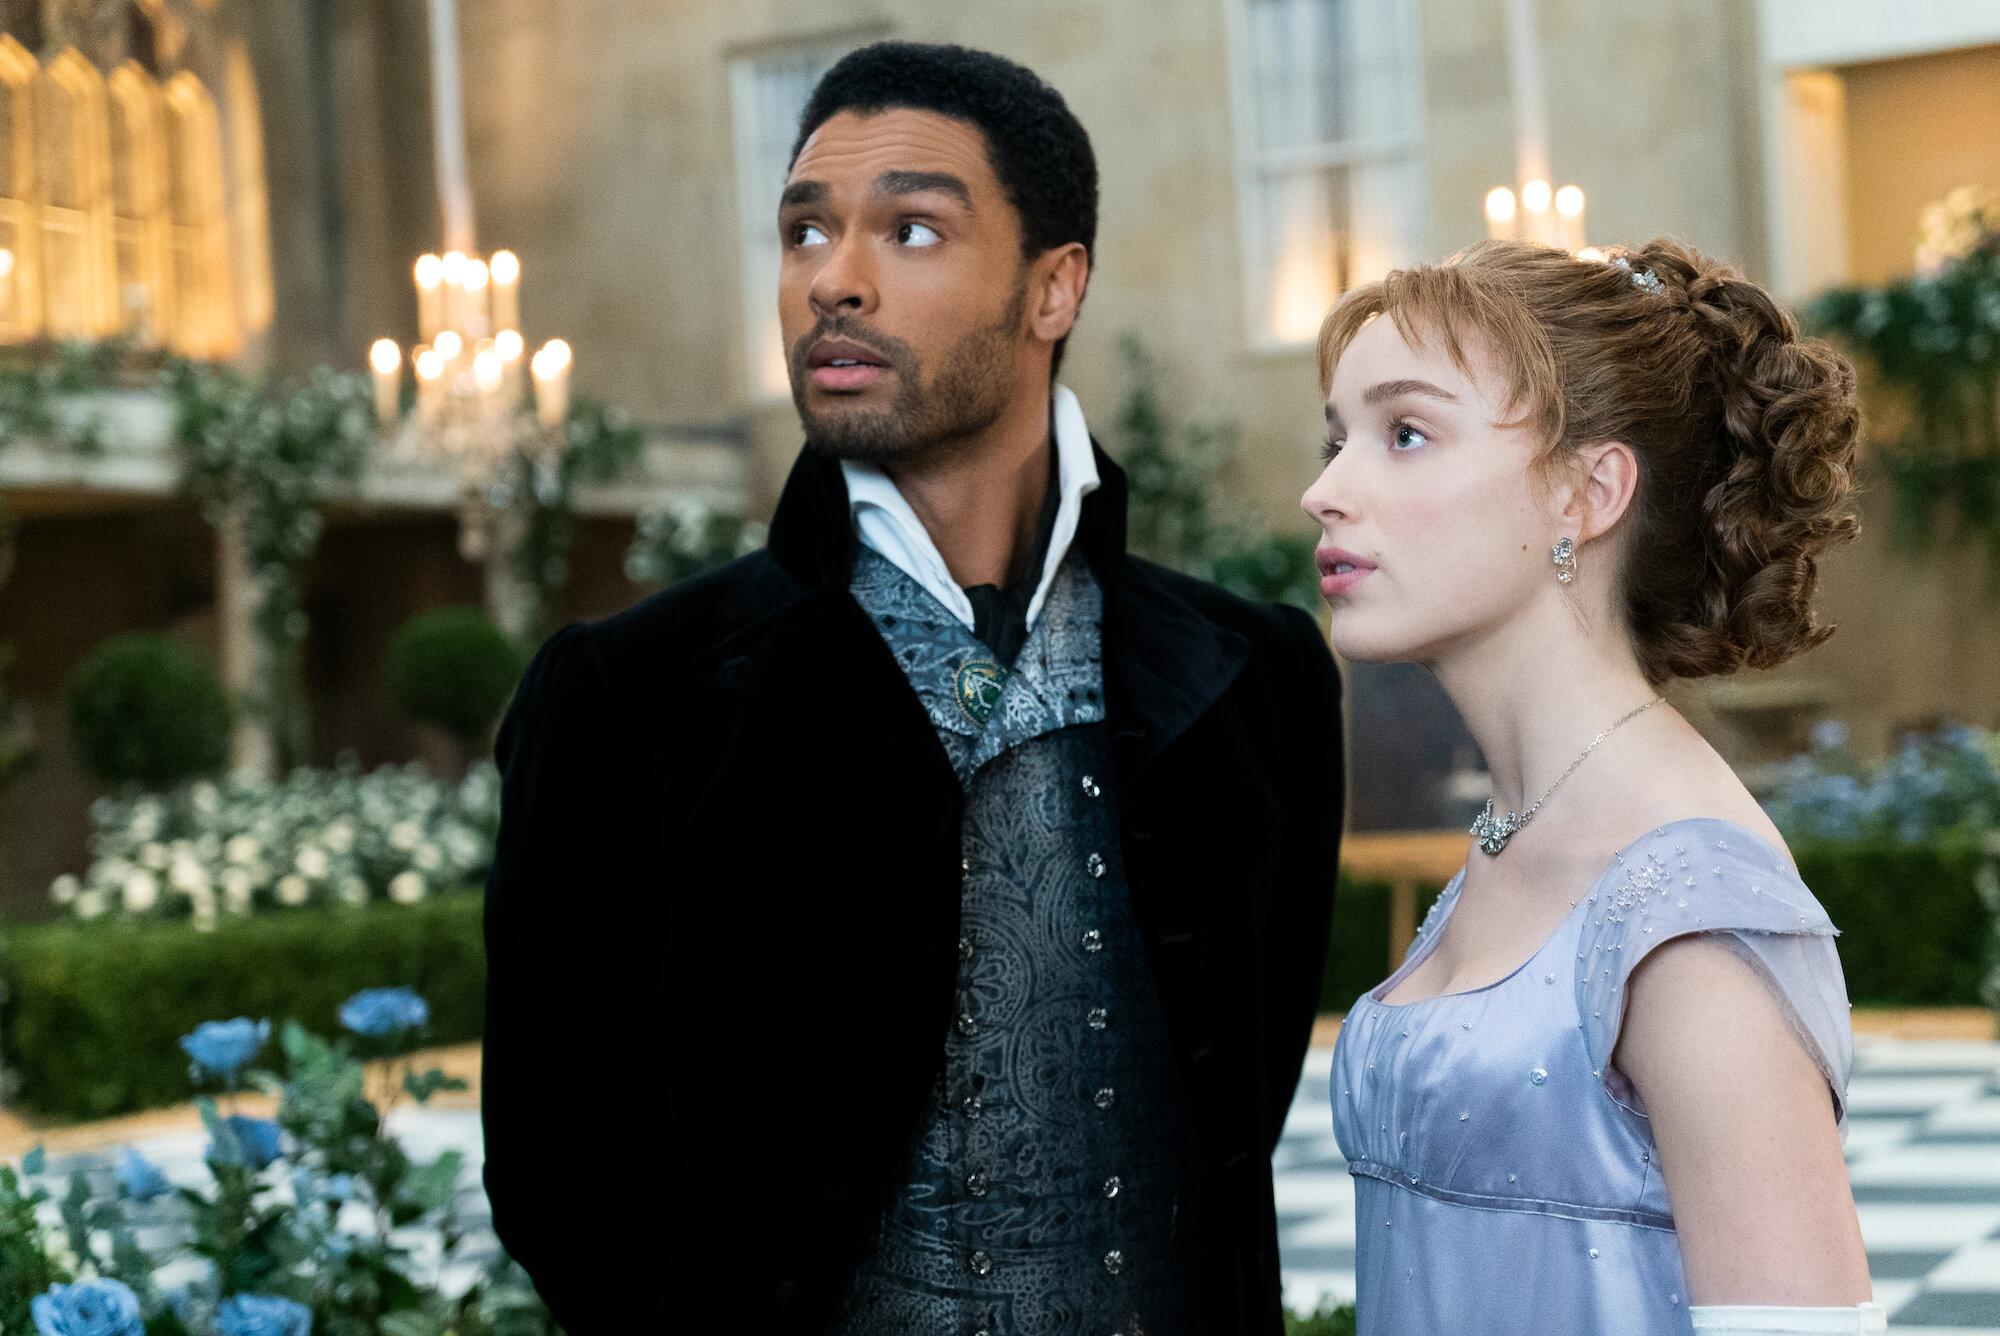 BRIDGERTON:  REGÉ-JEAN PAGE as SIMON BASSET and PHOEBE DYNEVOR as DAPHNE BRIDGERTON in episode 108